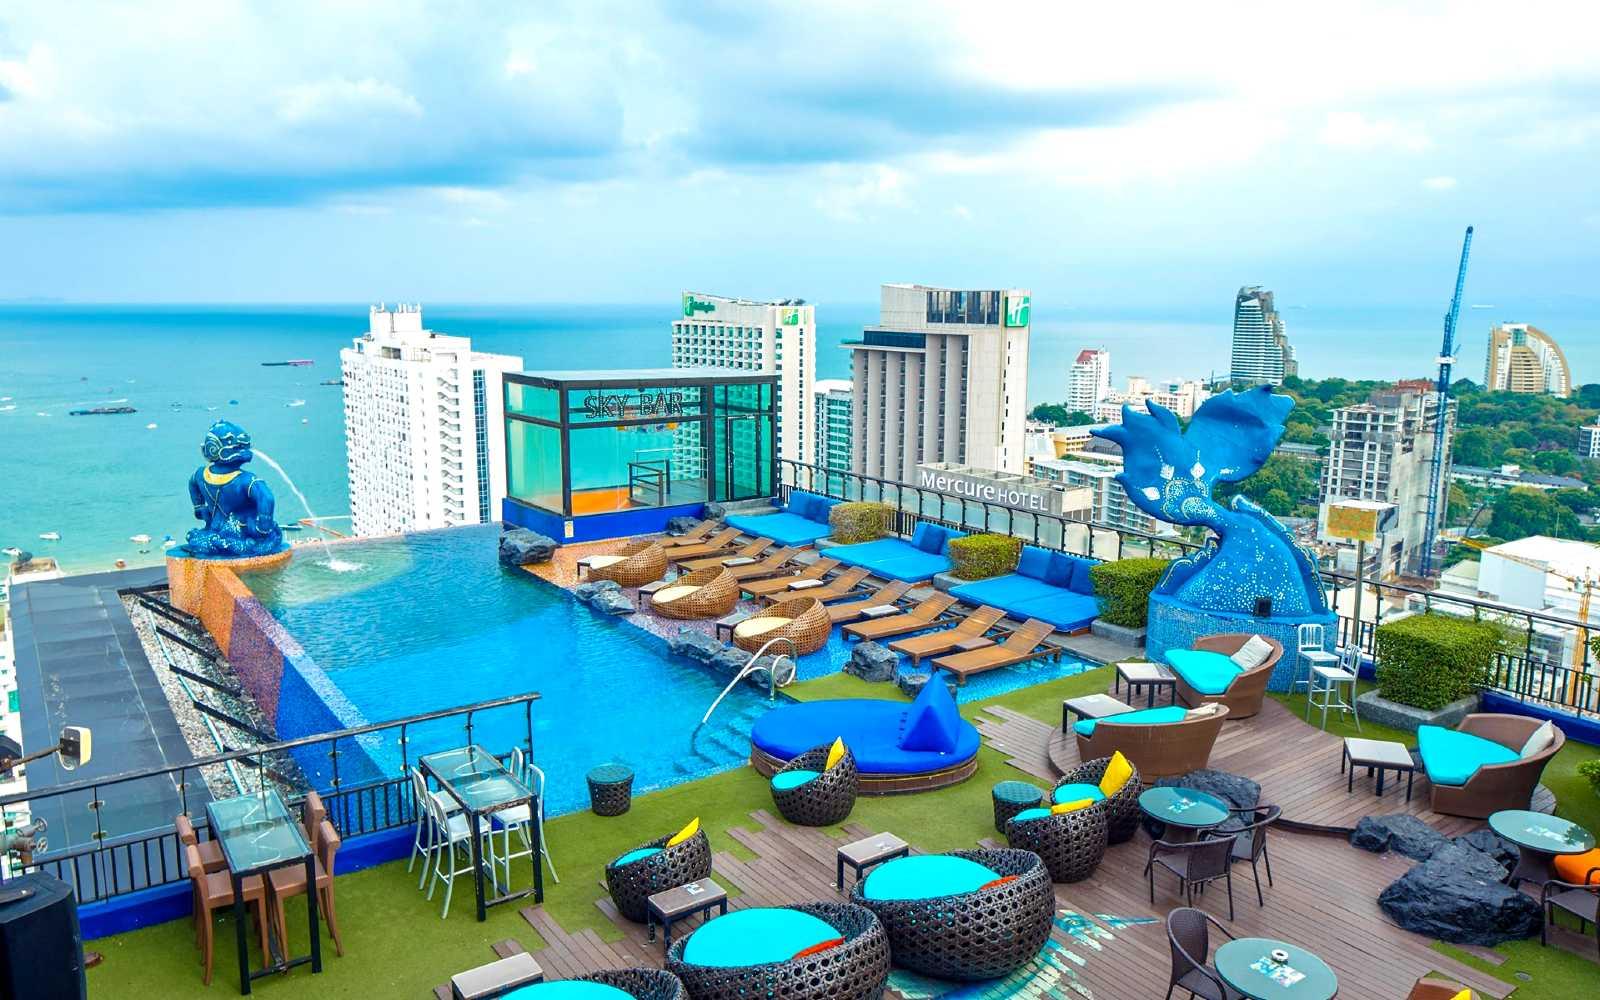 Sky Bar Siam@Siam Pattaya pool and rooftop bar with sea views